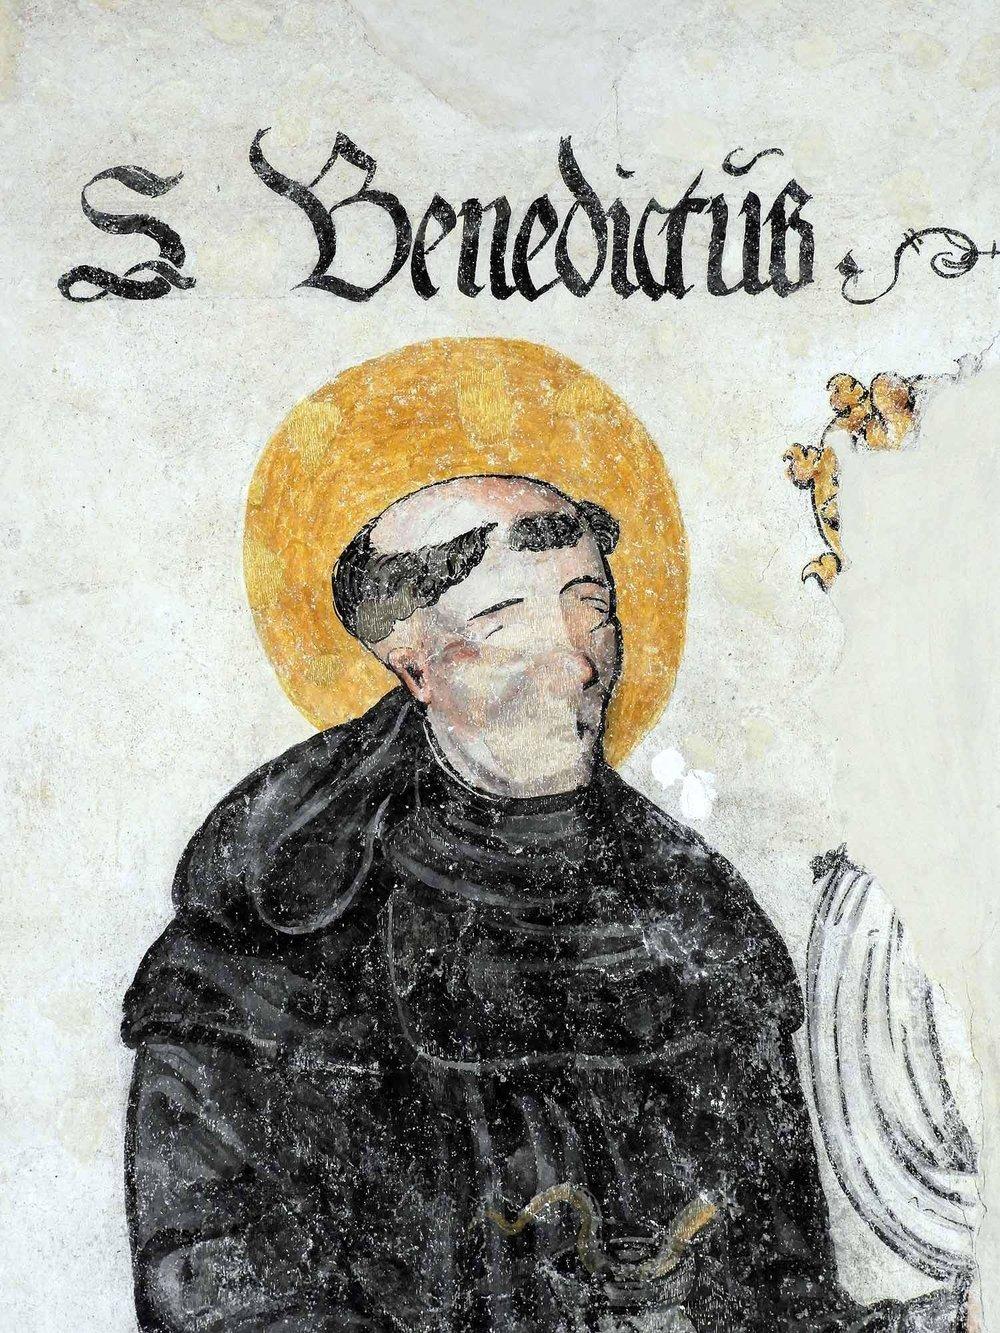 germany-kloster-ochsenhausen-fresco-monk-saint-benedictus.jpg